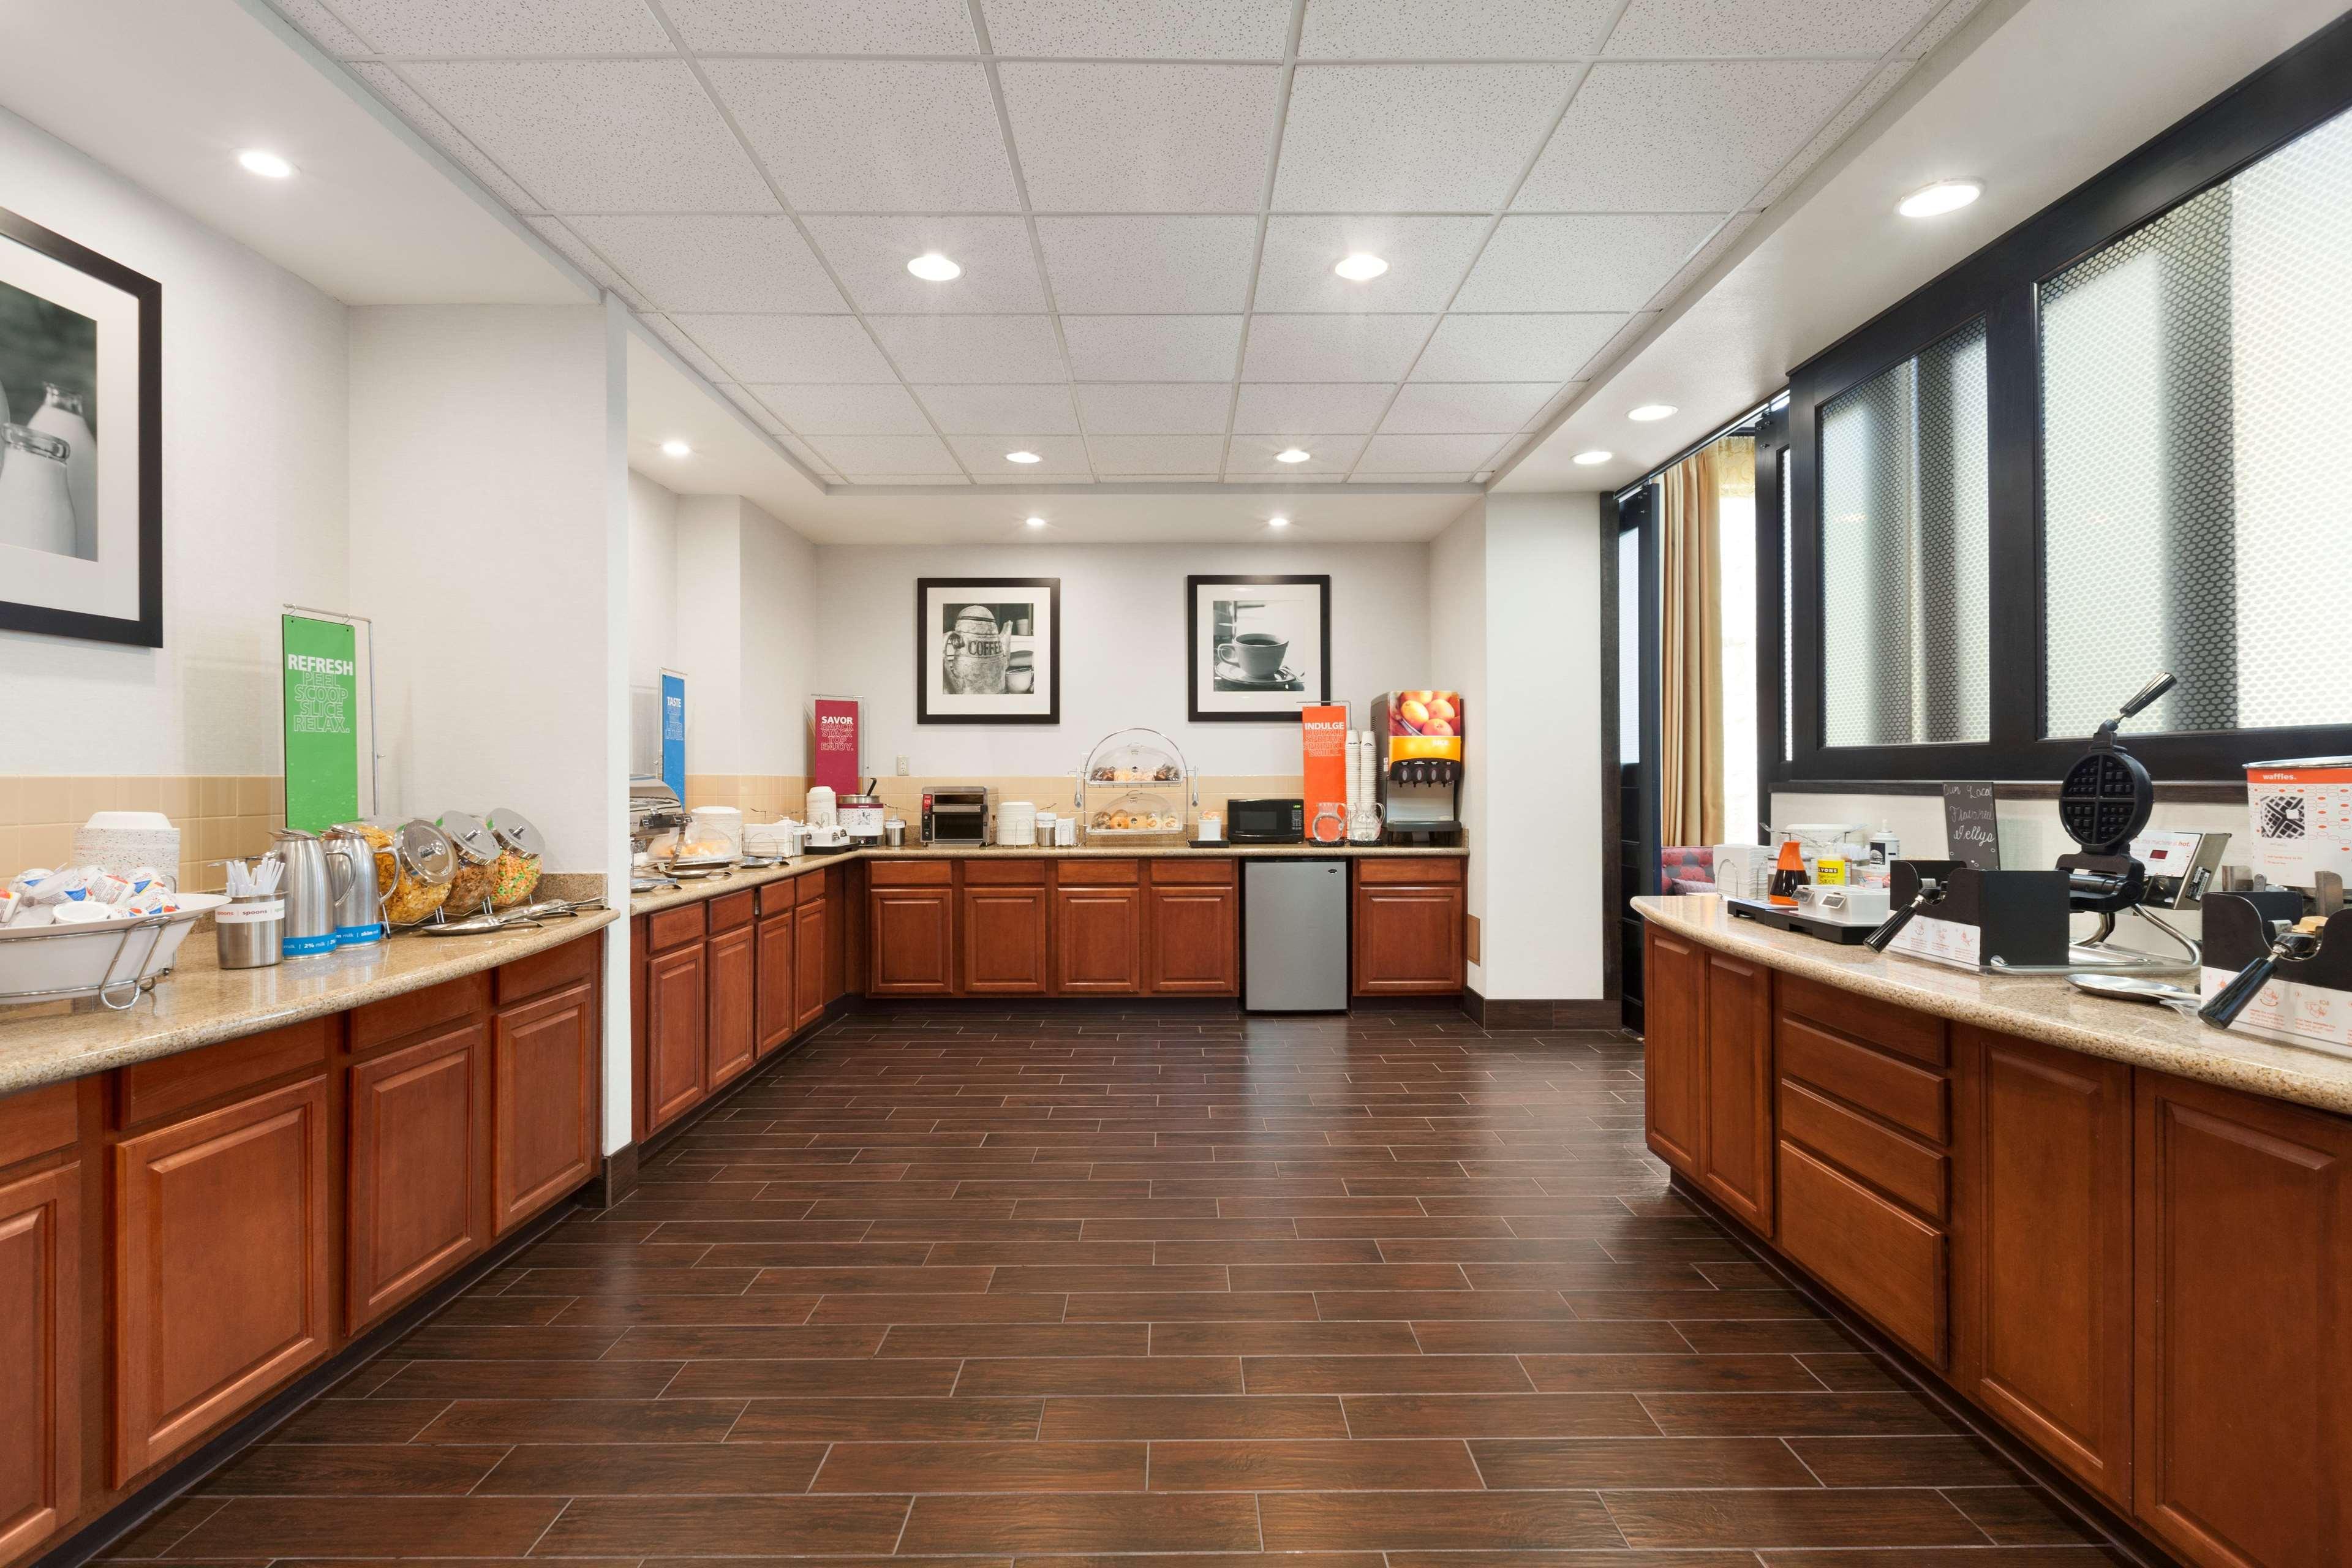 Hampton Inn & Suites Rohnert Park - Sonoma County image 6